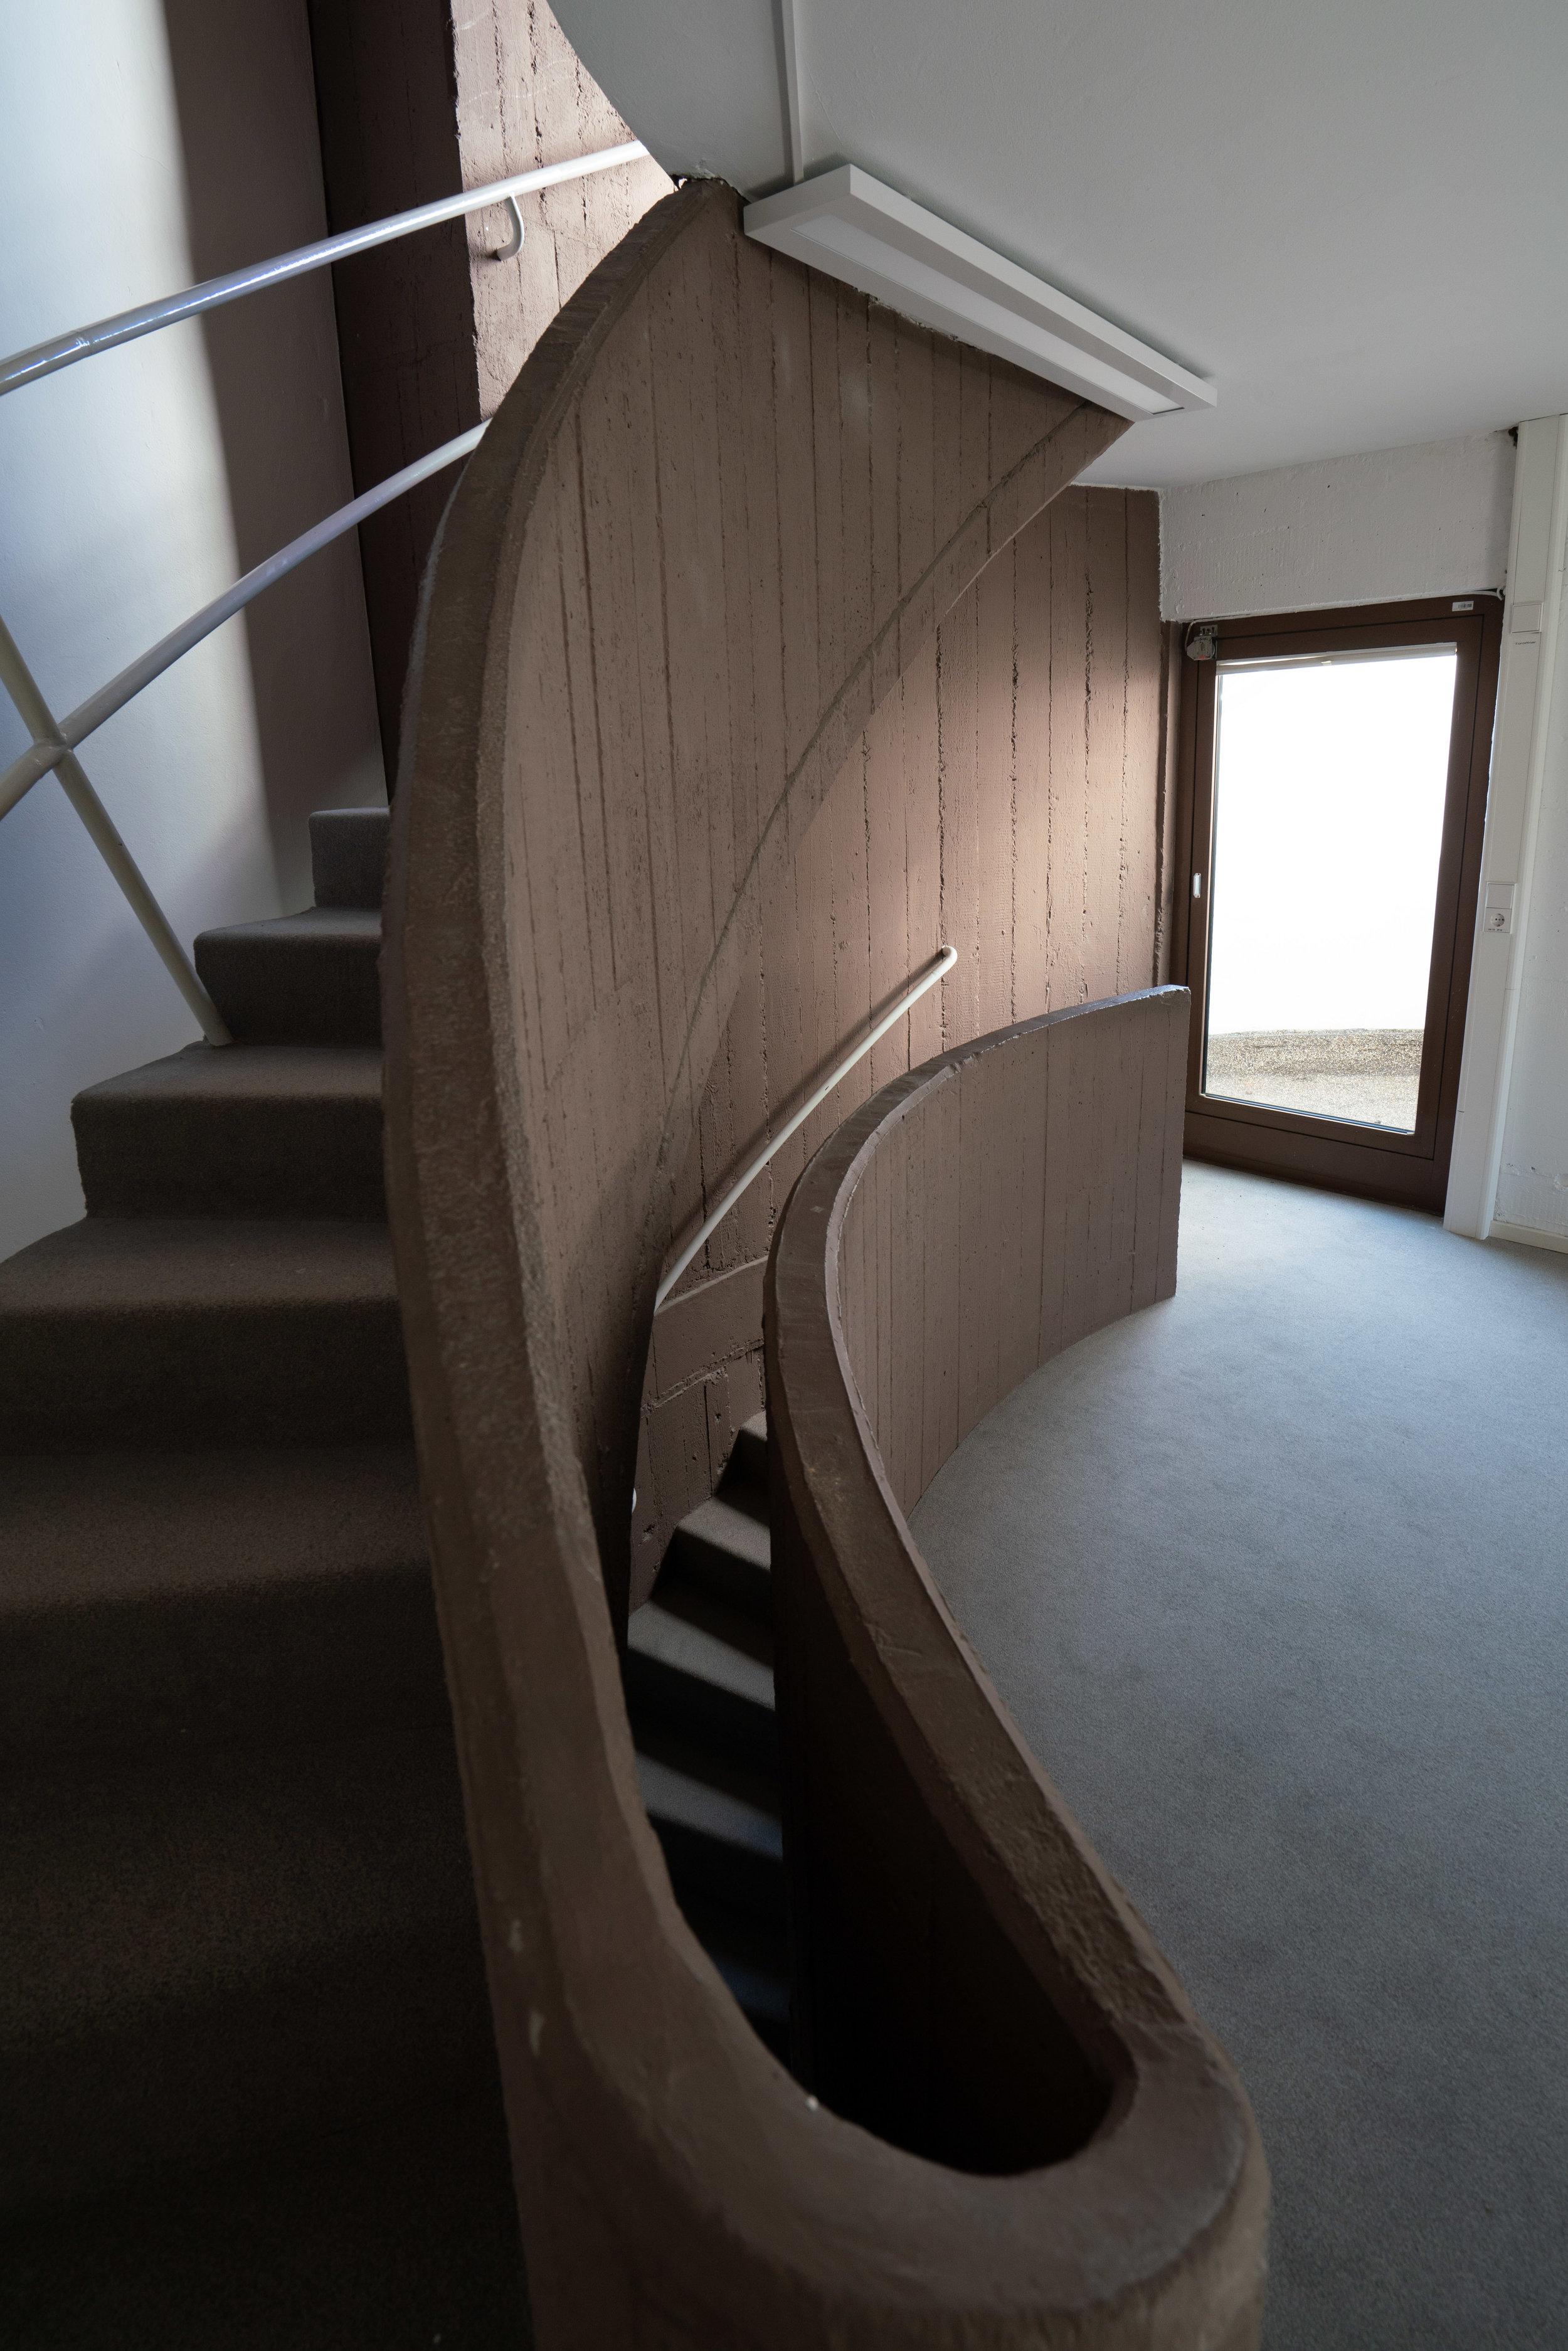 181012_Fehling+Gogel, Max Planck Institute_33.jpg